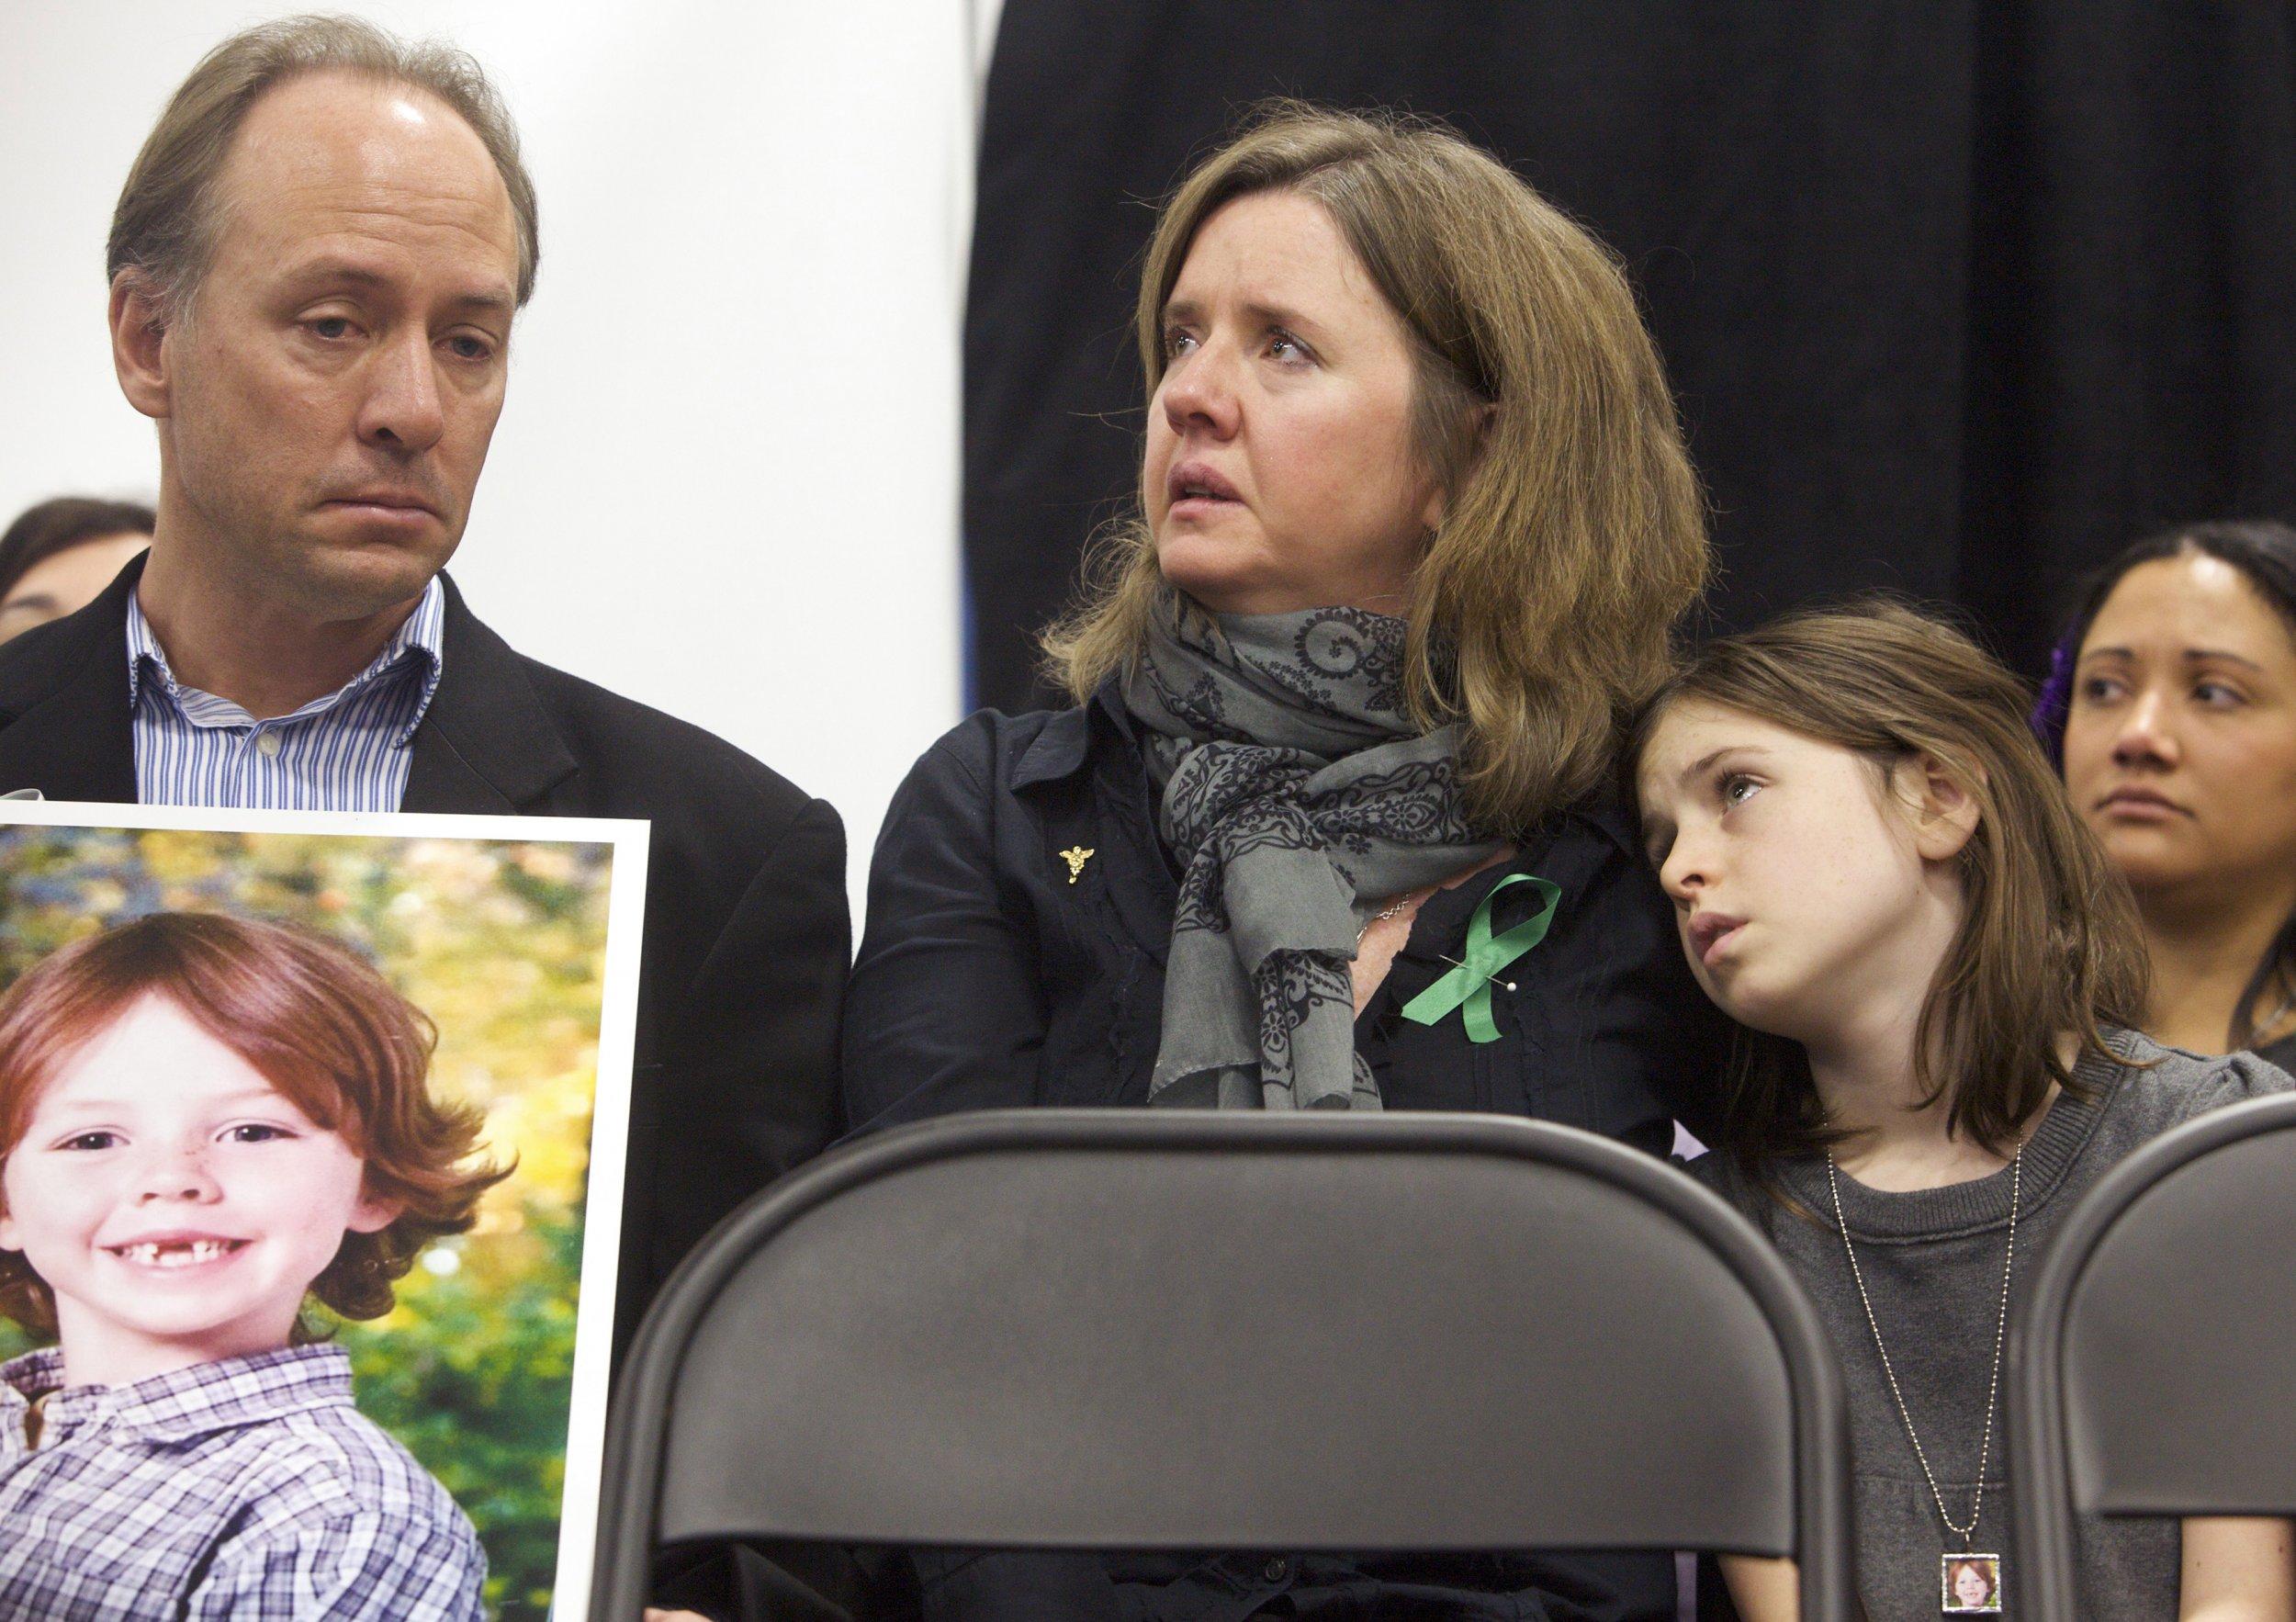 sandy hook parents call out bernie sanders for gunmaker